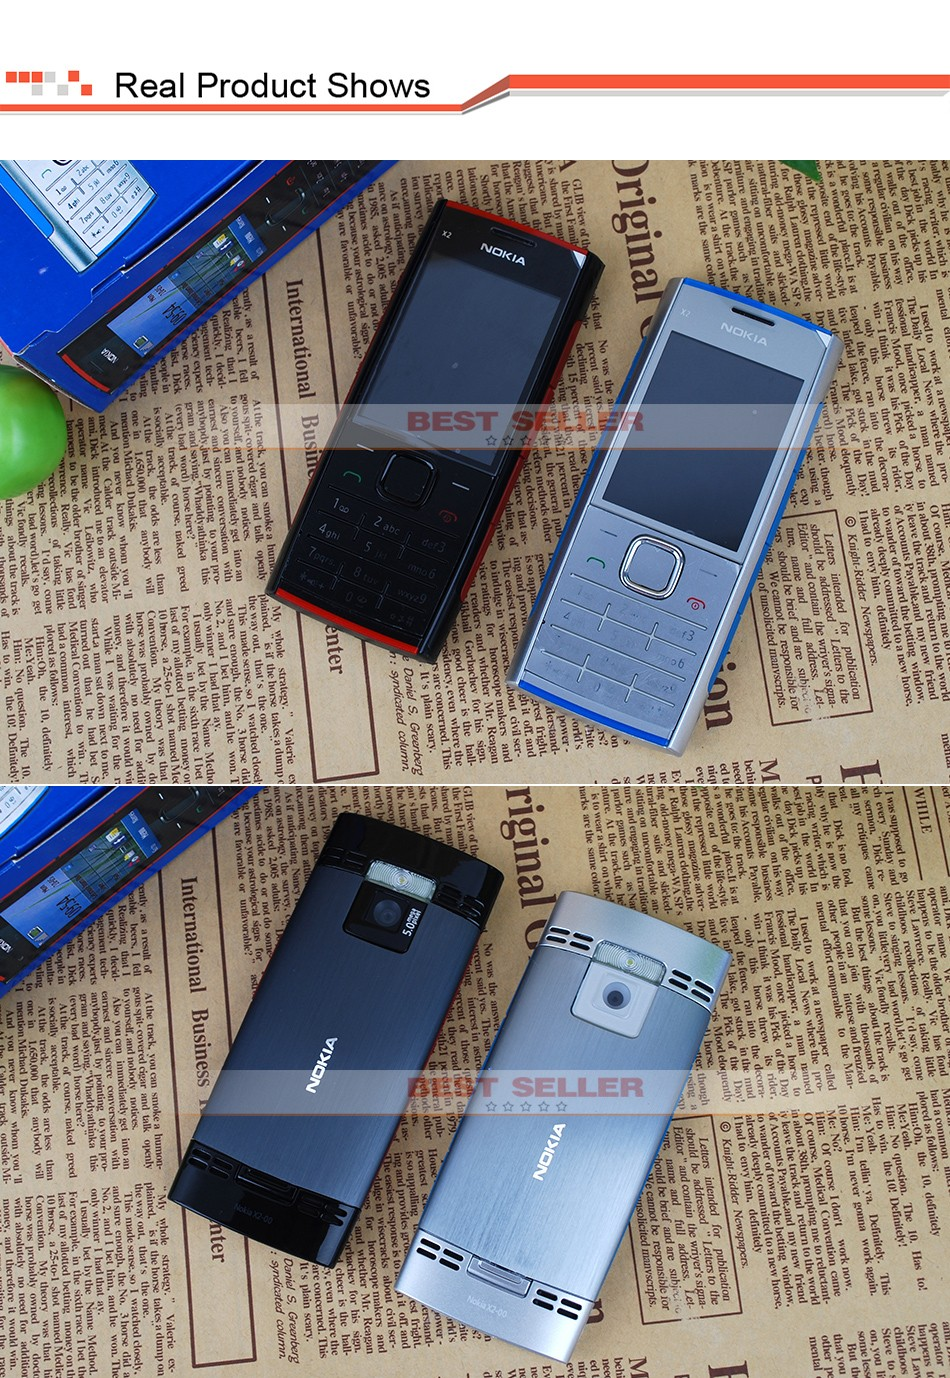 Refurbished phone Nokia X2-00 Bluetooth FM JAVA 5MP Cell Phones Free Shipping black 4